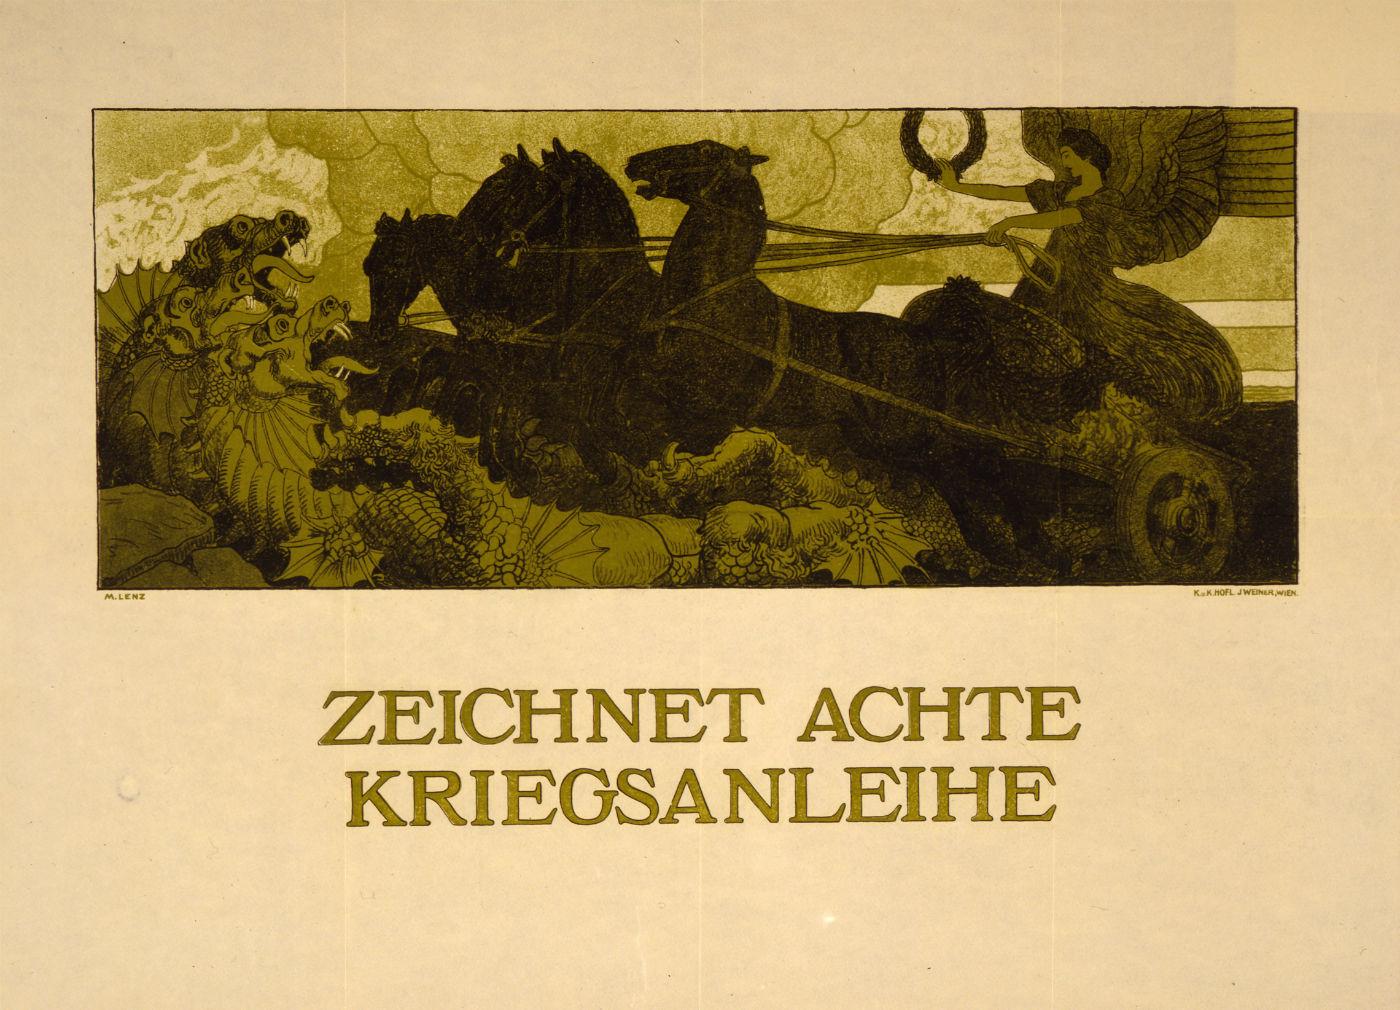 Maximilian Lenz - 1917 - Zeichnet achte Kriegsanleihe